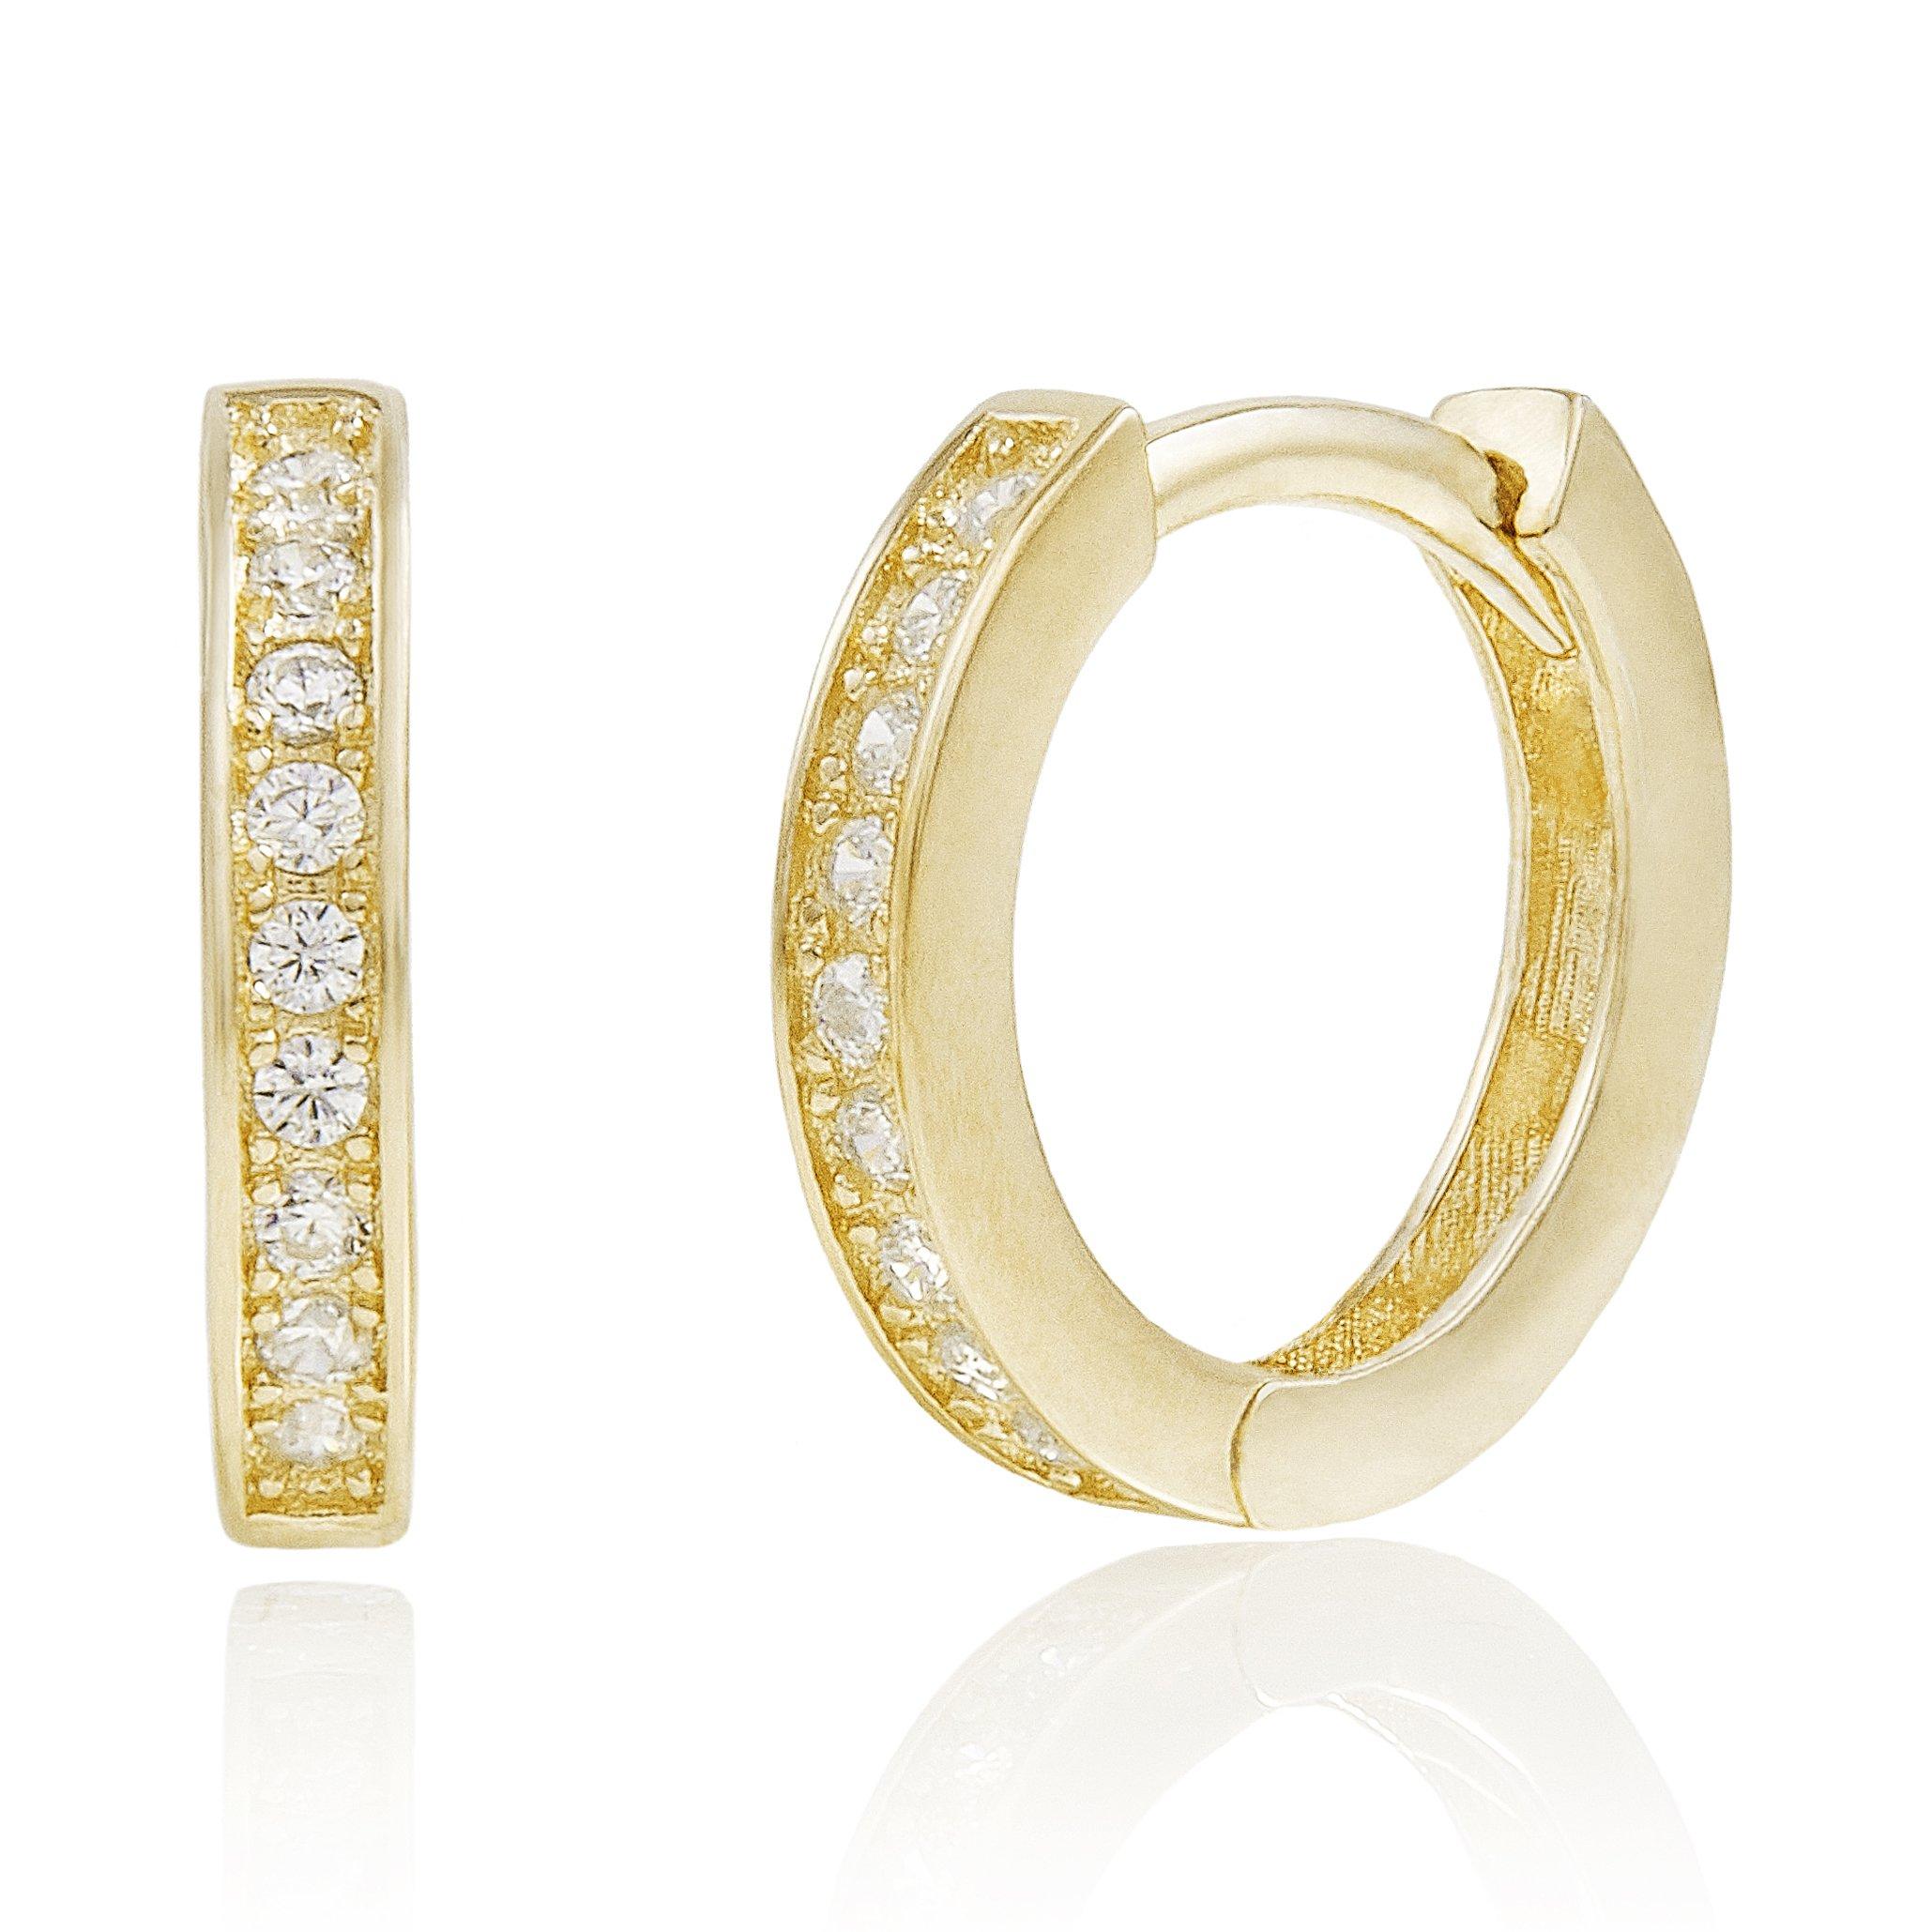 Yellow Gold Plated Sterling Silver Cubic Zirconia Huggie Hoop Earrings by Spoil Cupid (Image #1)